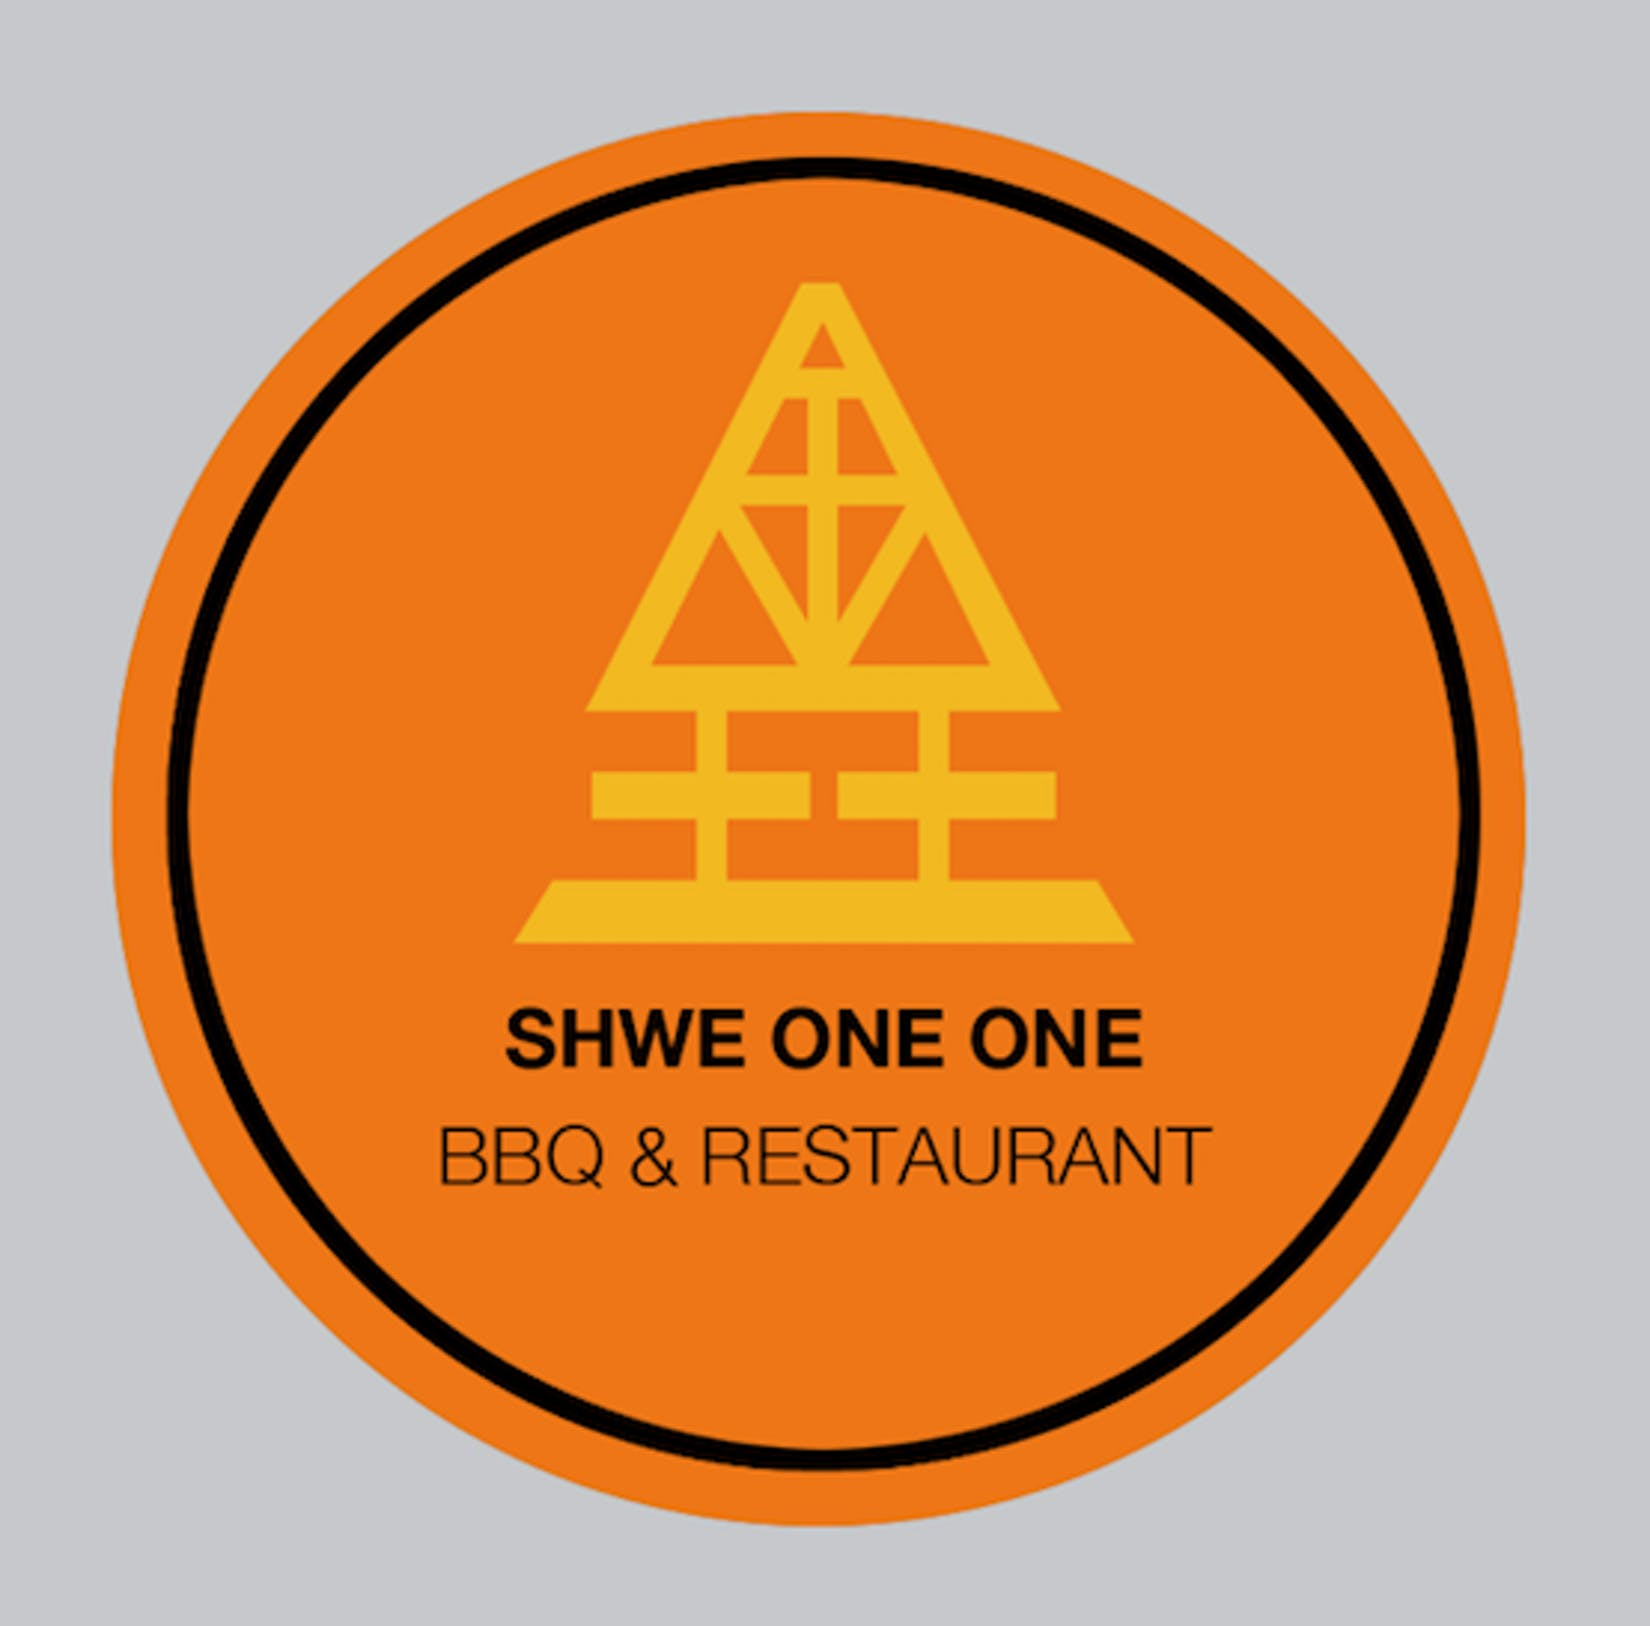 Shwe One One BBQ & Restaurant   yathar